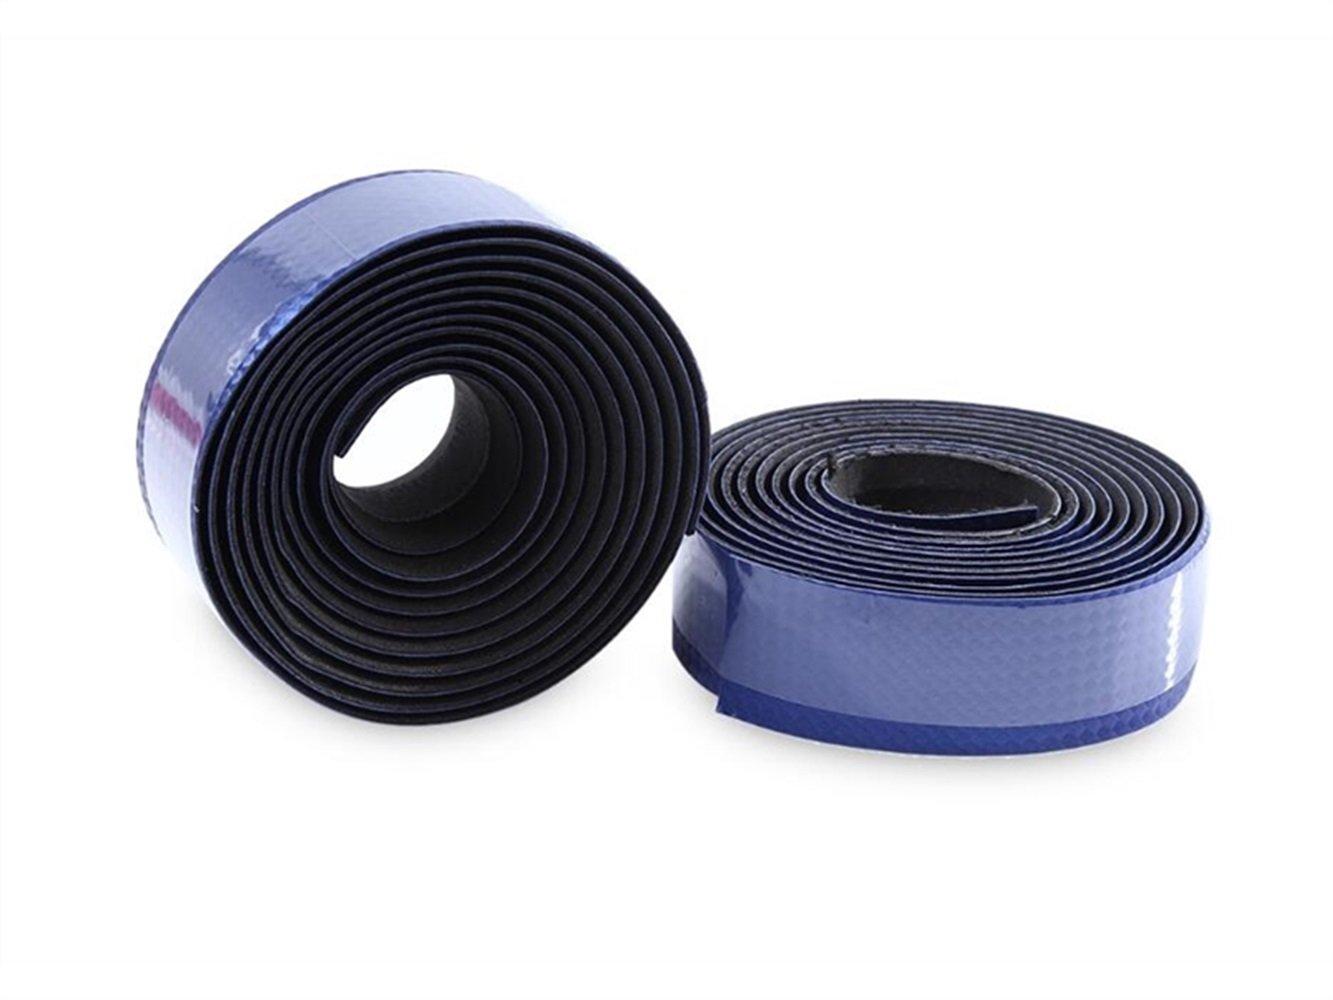 OVVO Besonders Anti Skid Kohlefaser Fahrrad Bar Tape Griff Strap Fahrrad Fixed Gear Bar/Lenkerband Verband (Blau)